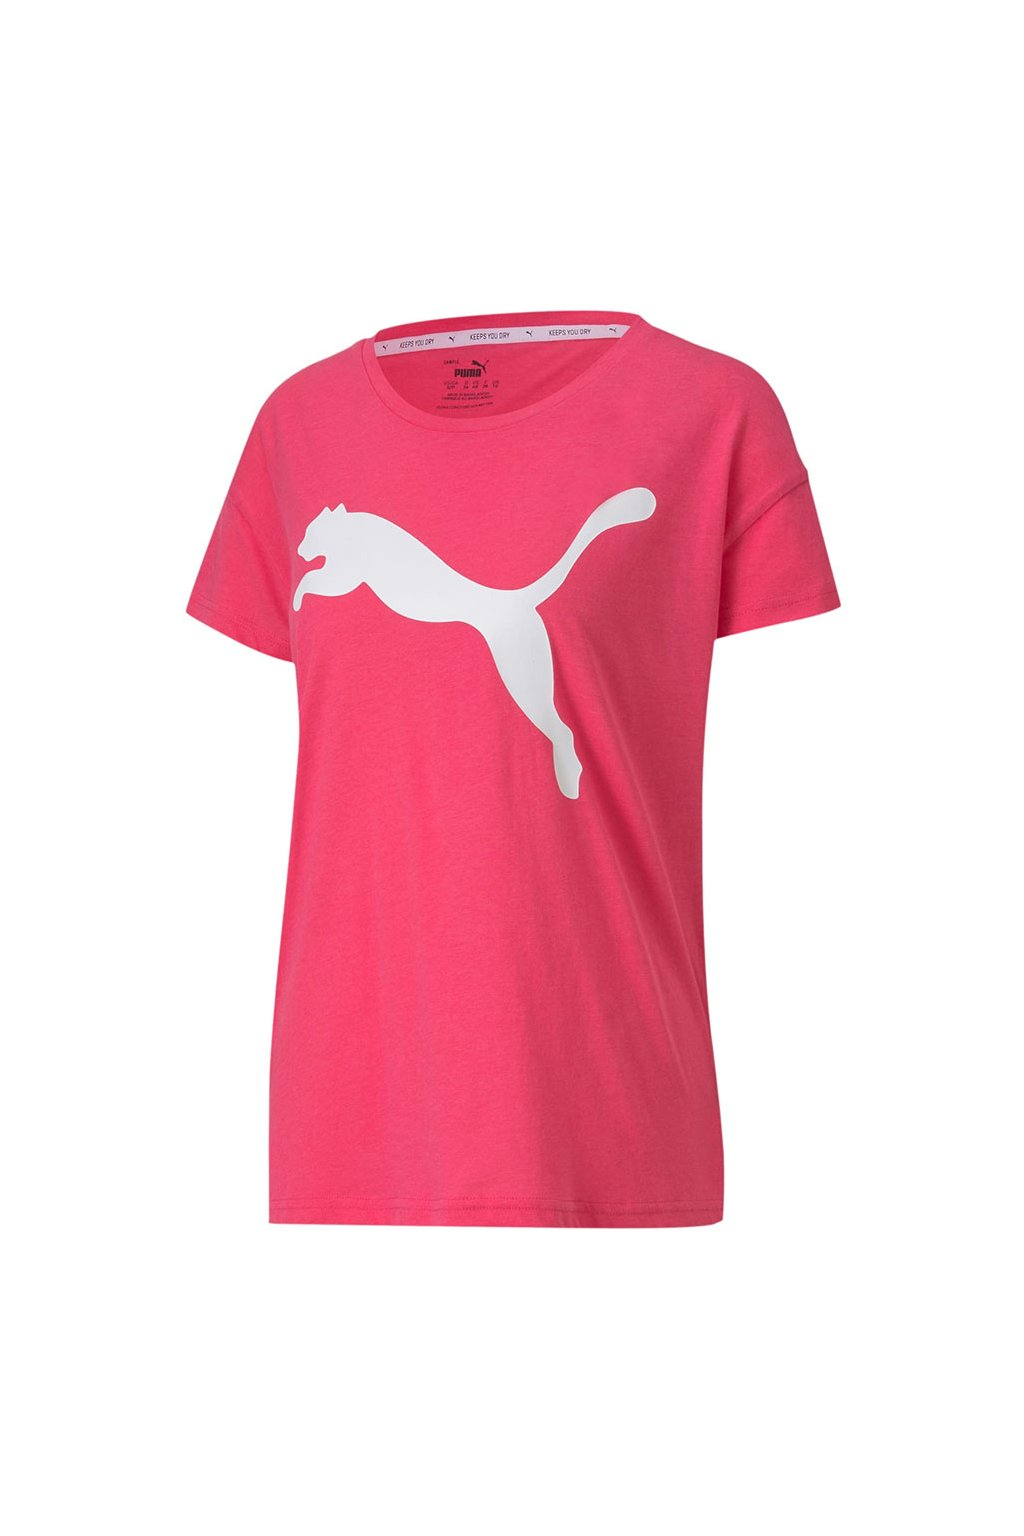 Dámske tričko Puma Active Logo Tee Glowing ružové 852006 76